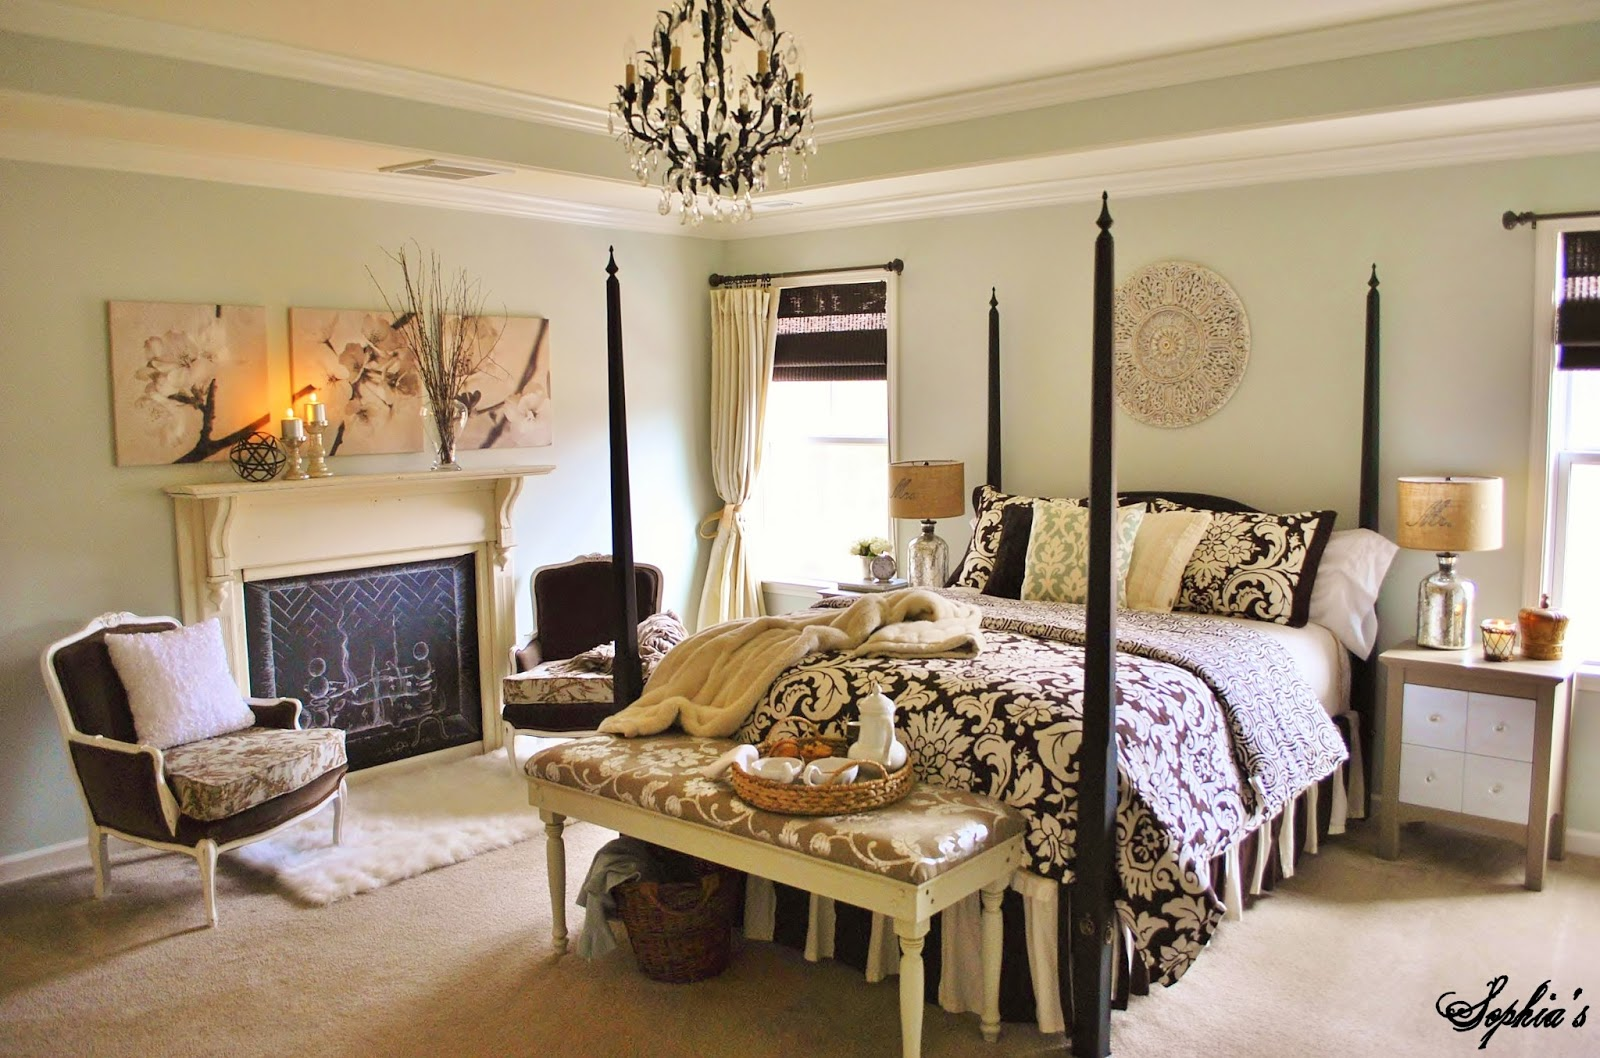 sophia 39 s house tour. Black Bedroom Furniture Sets. Home Design Ideas